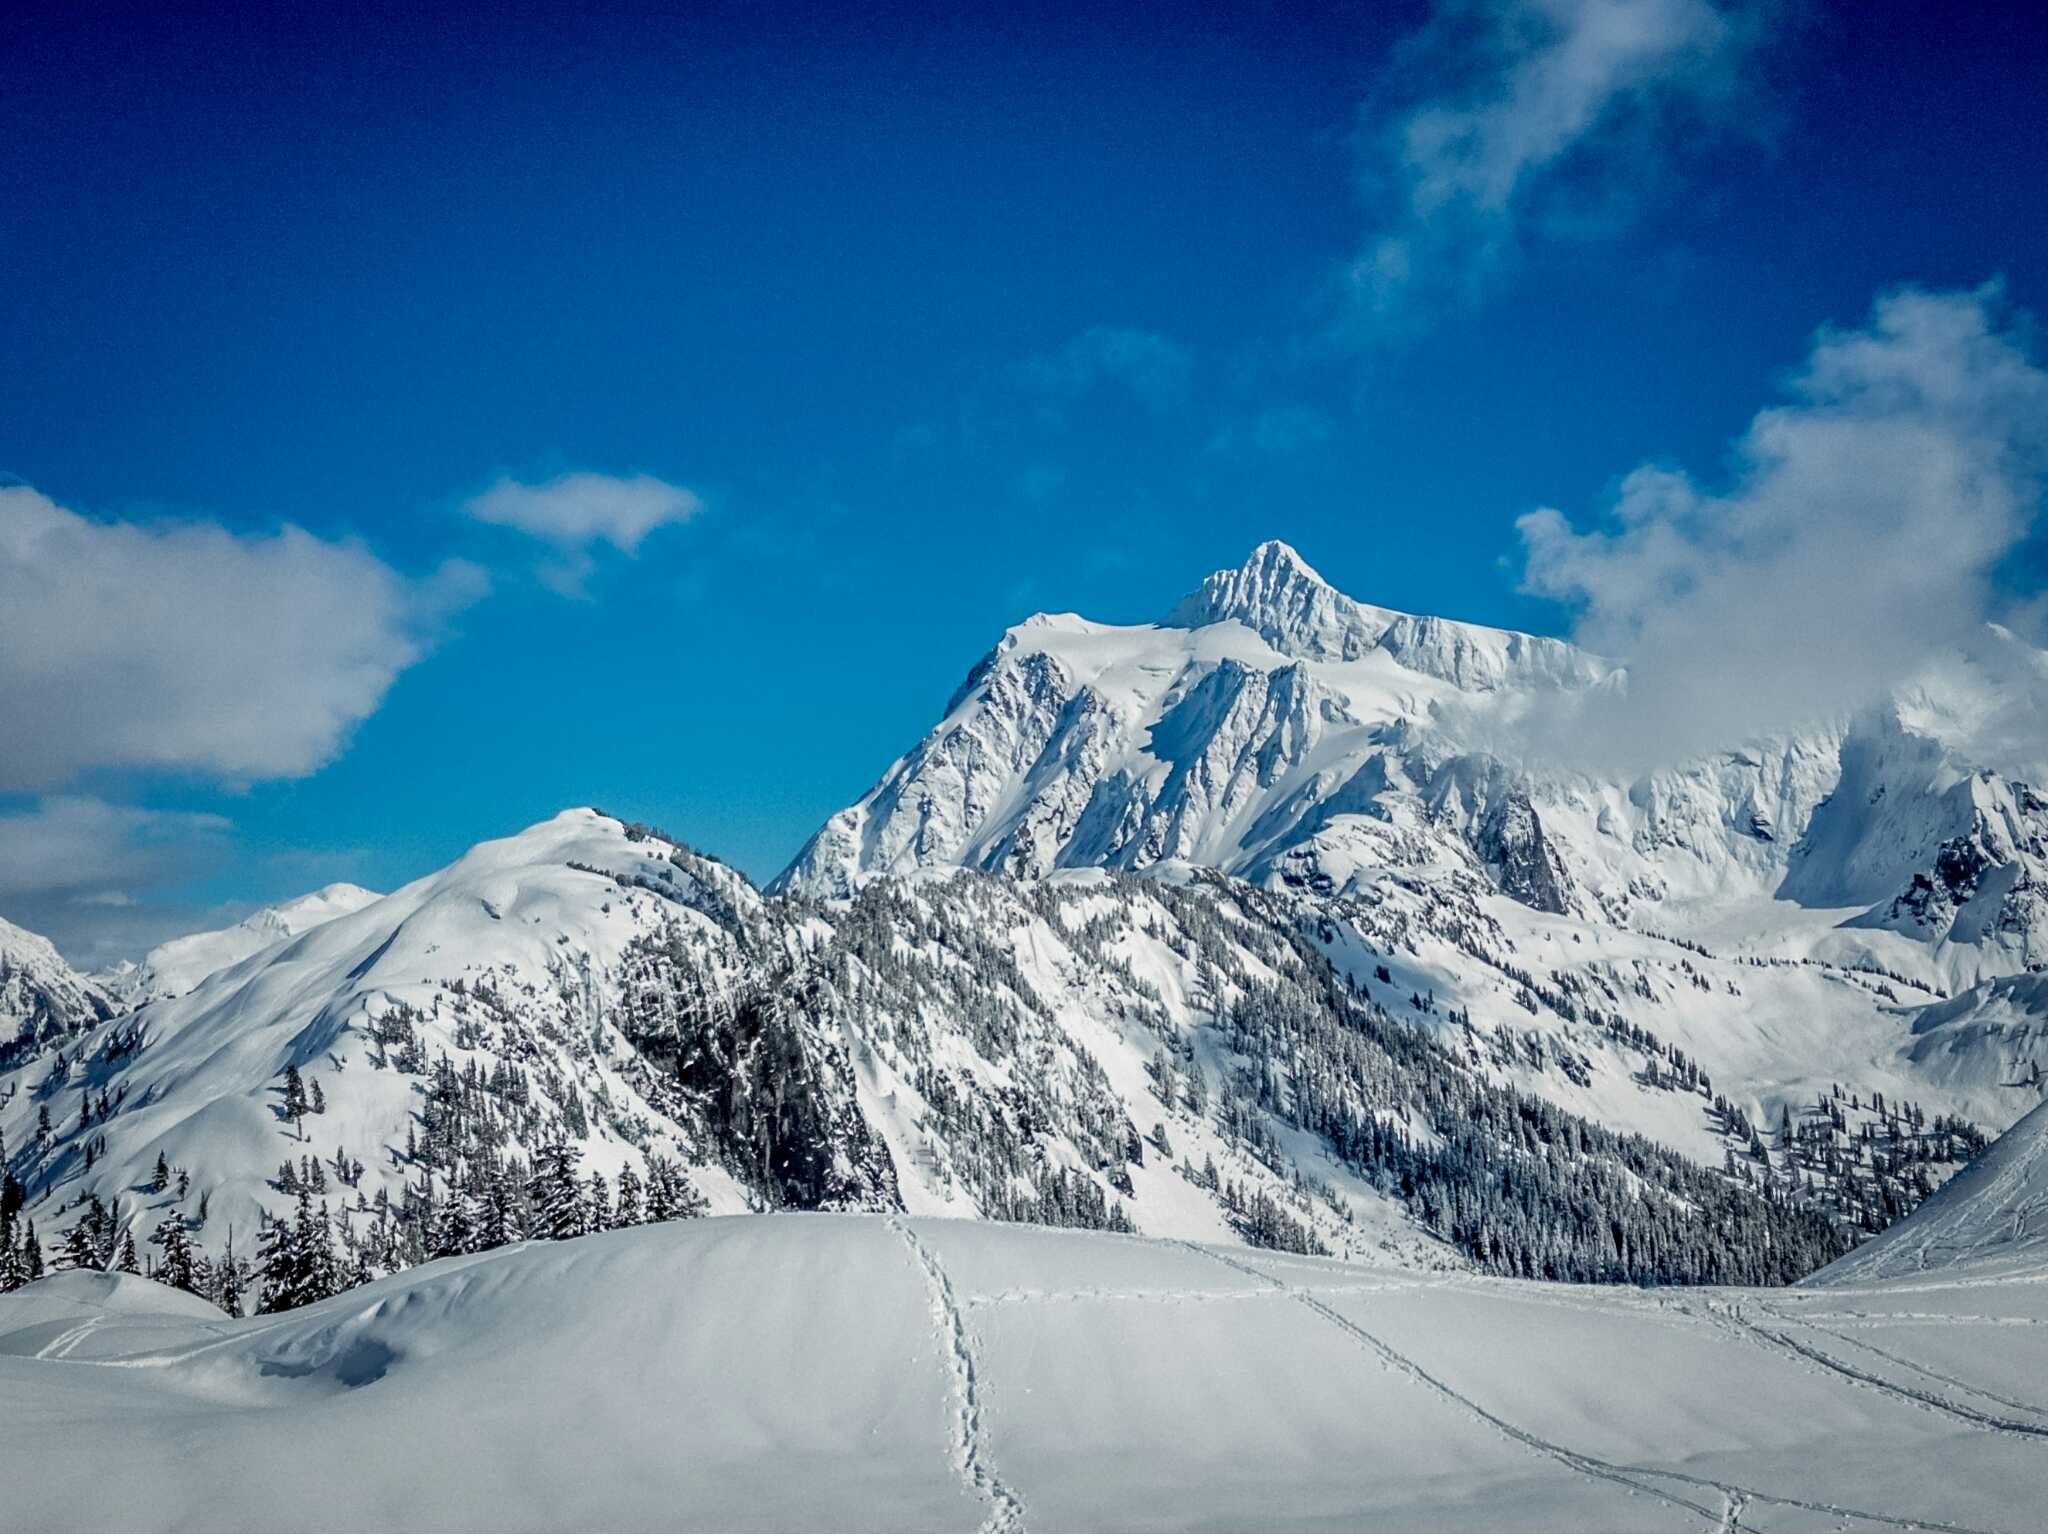 Artist Point. Photo by Bpas..jpeg Winter recreation